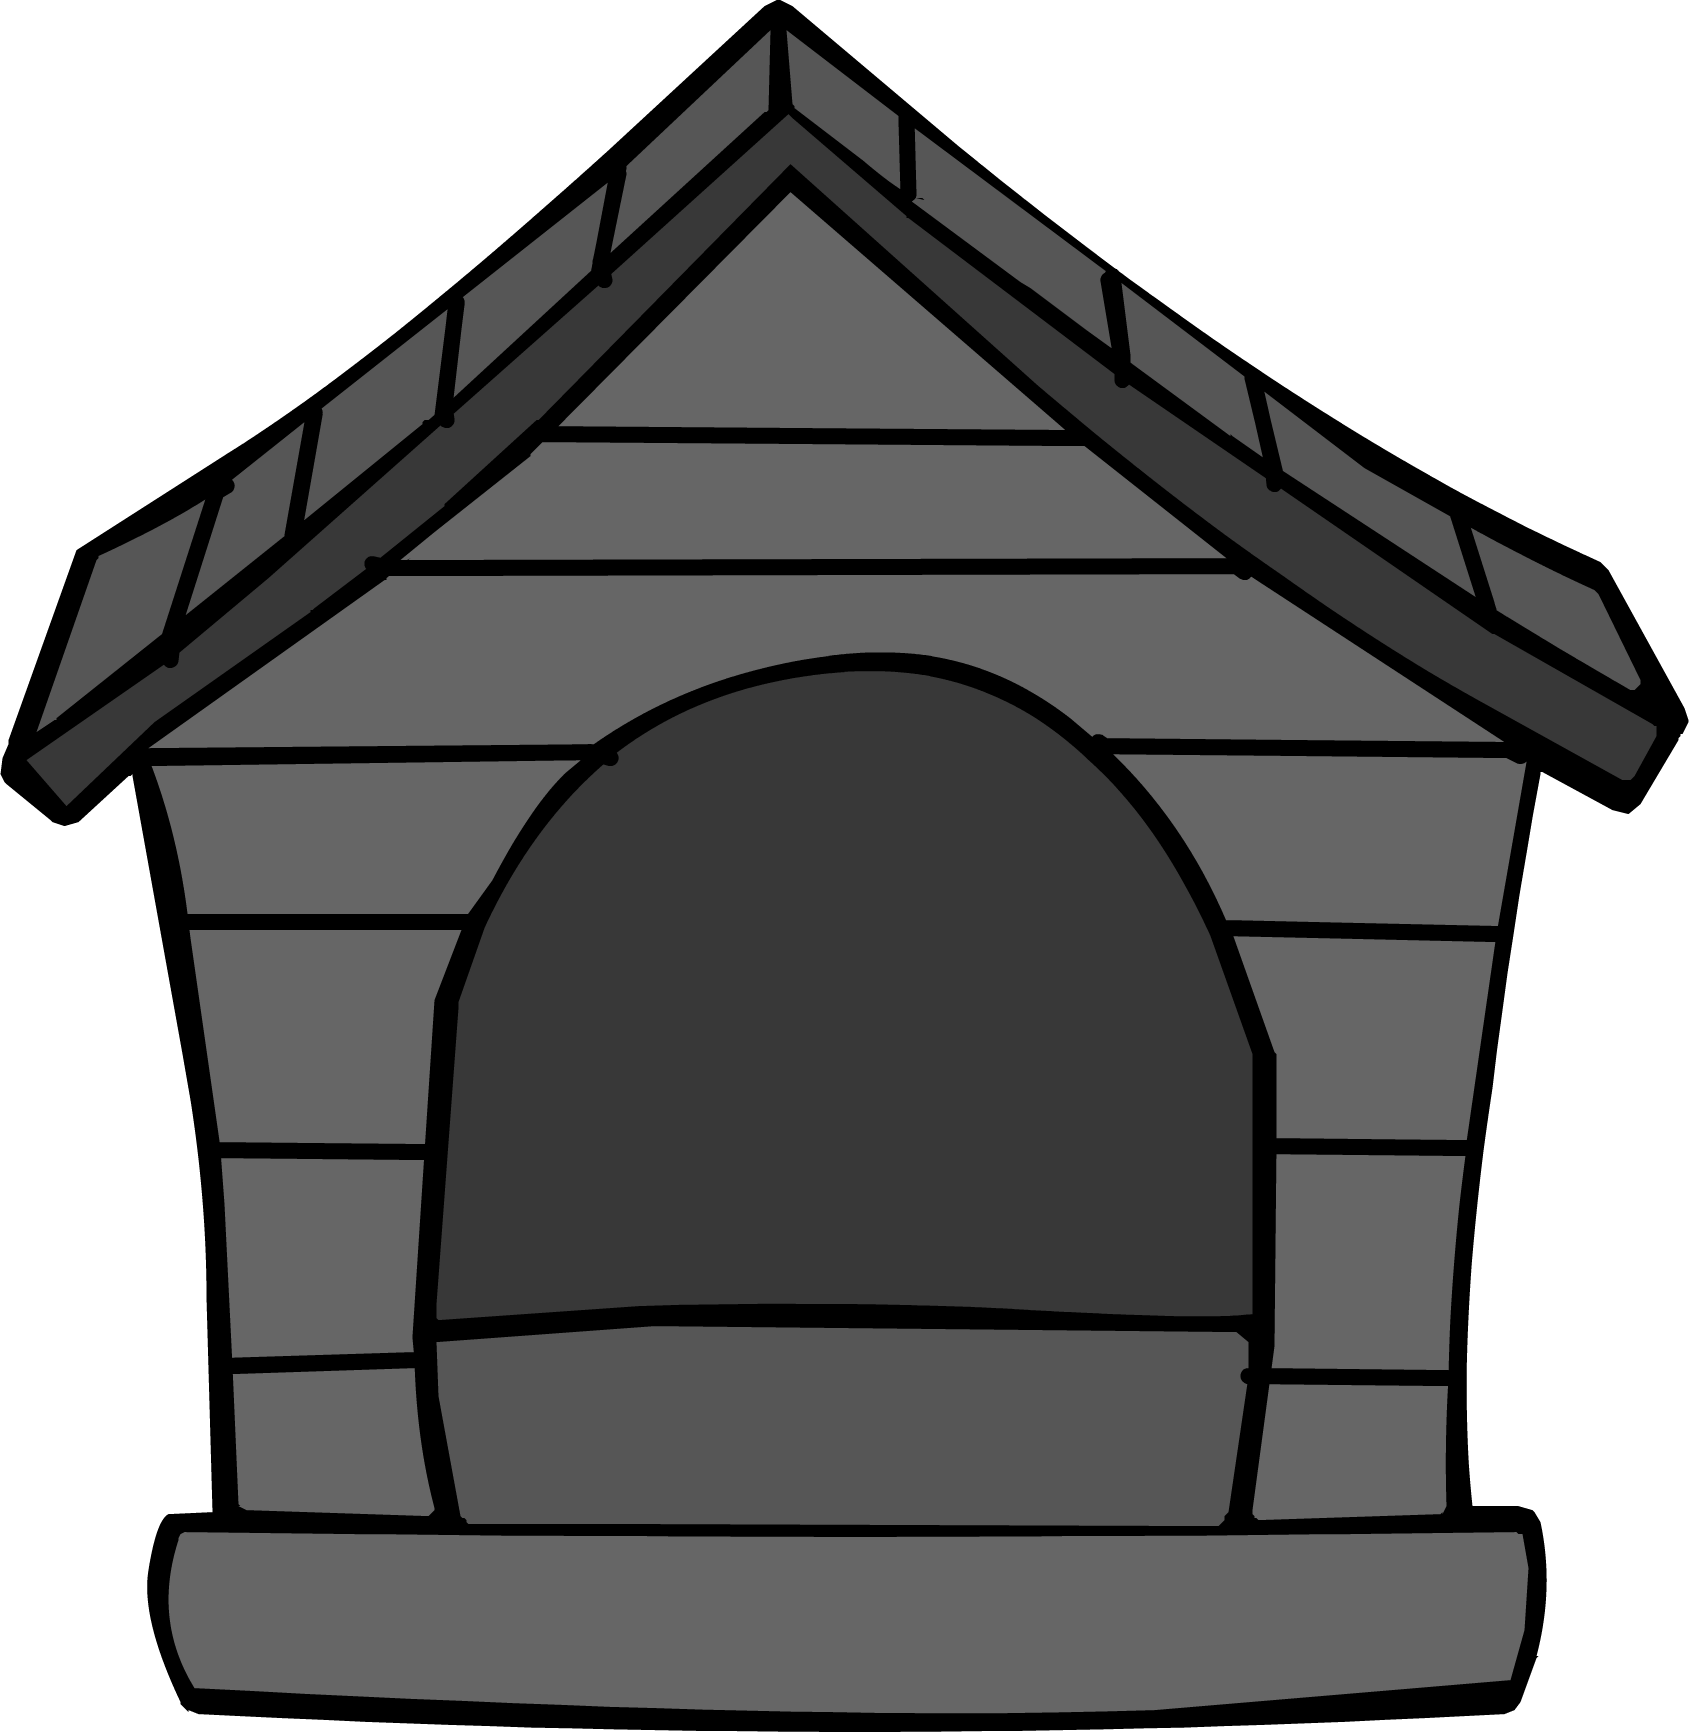 Black Puffle House